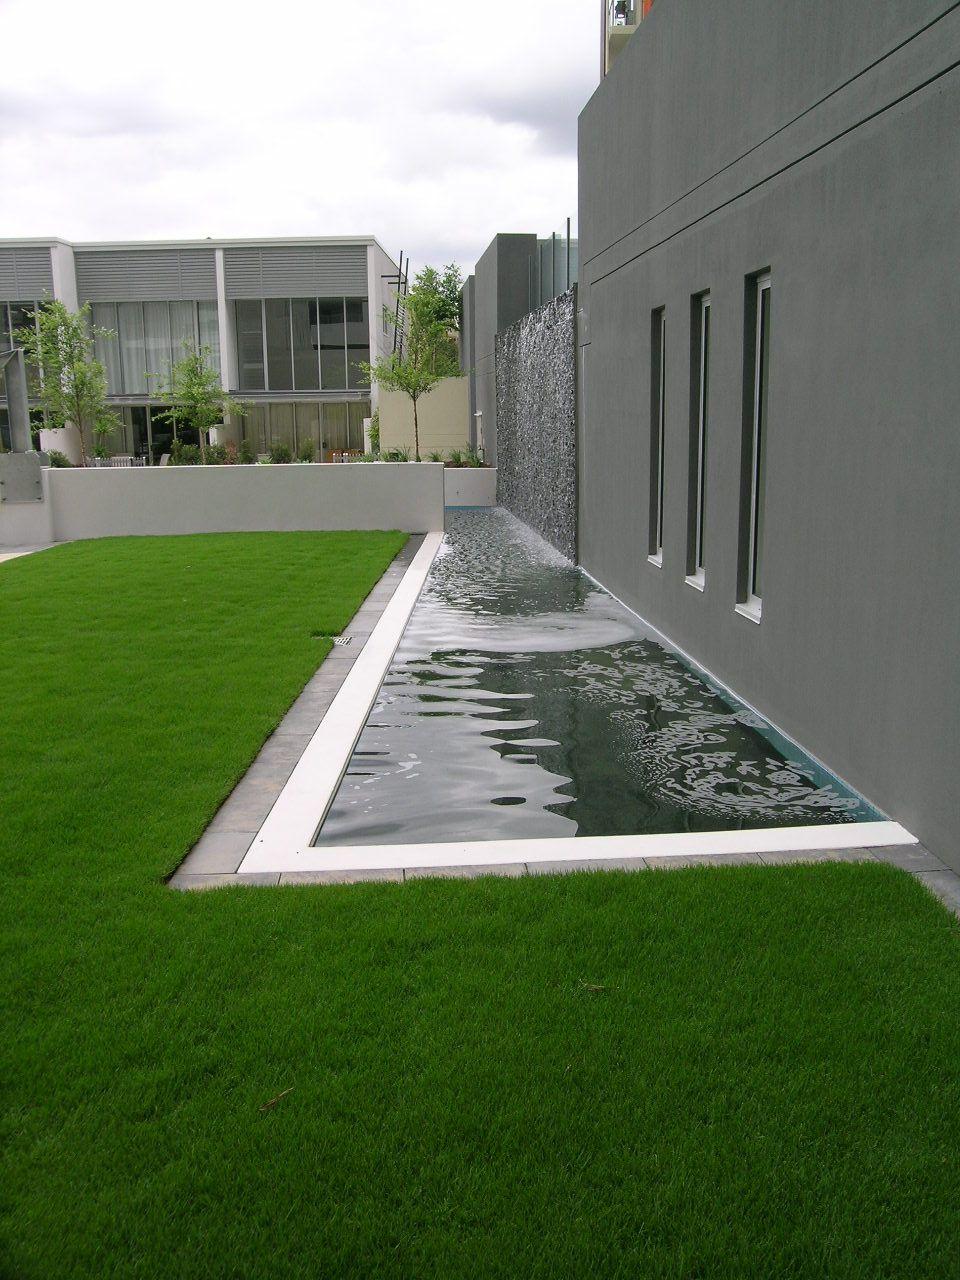 Commercial landscape architecture minimalist modern for Minimalist landscape design